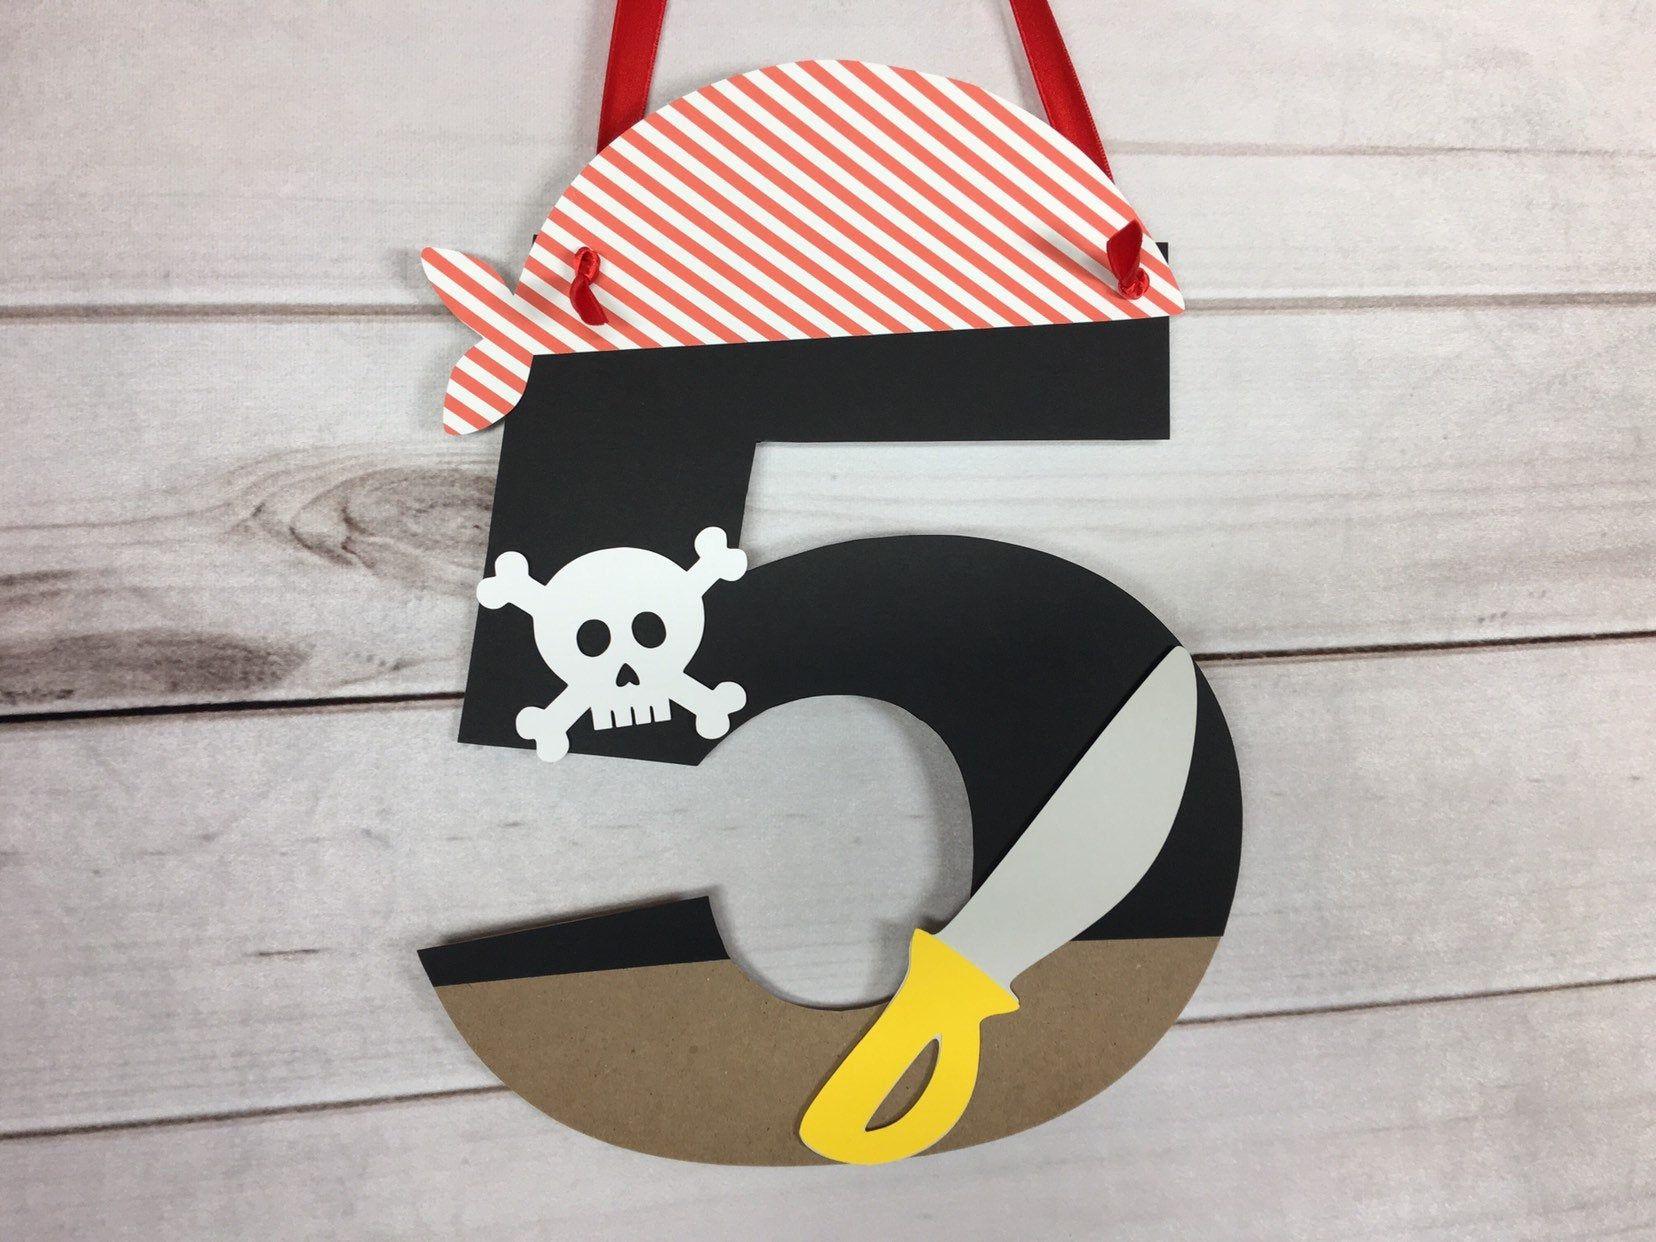 Beware of Pirates Door Cover Decoration Skull Head Swords Birthday Party Event